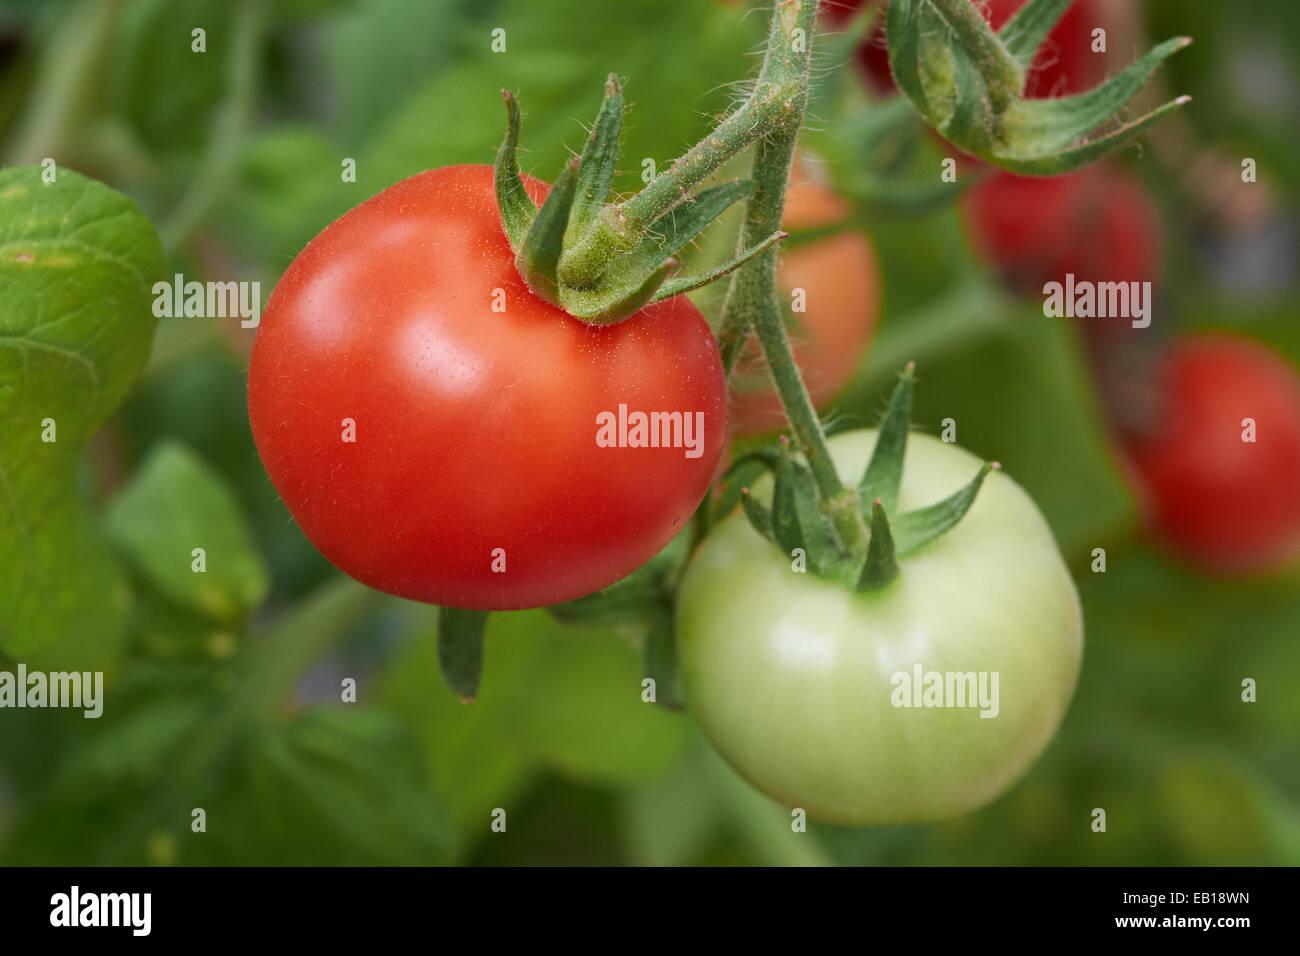 Ripe fresh tomatoes growing on the vine. Stock Photo